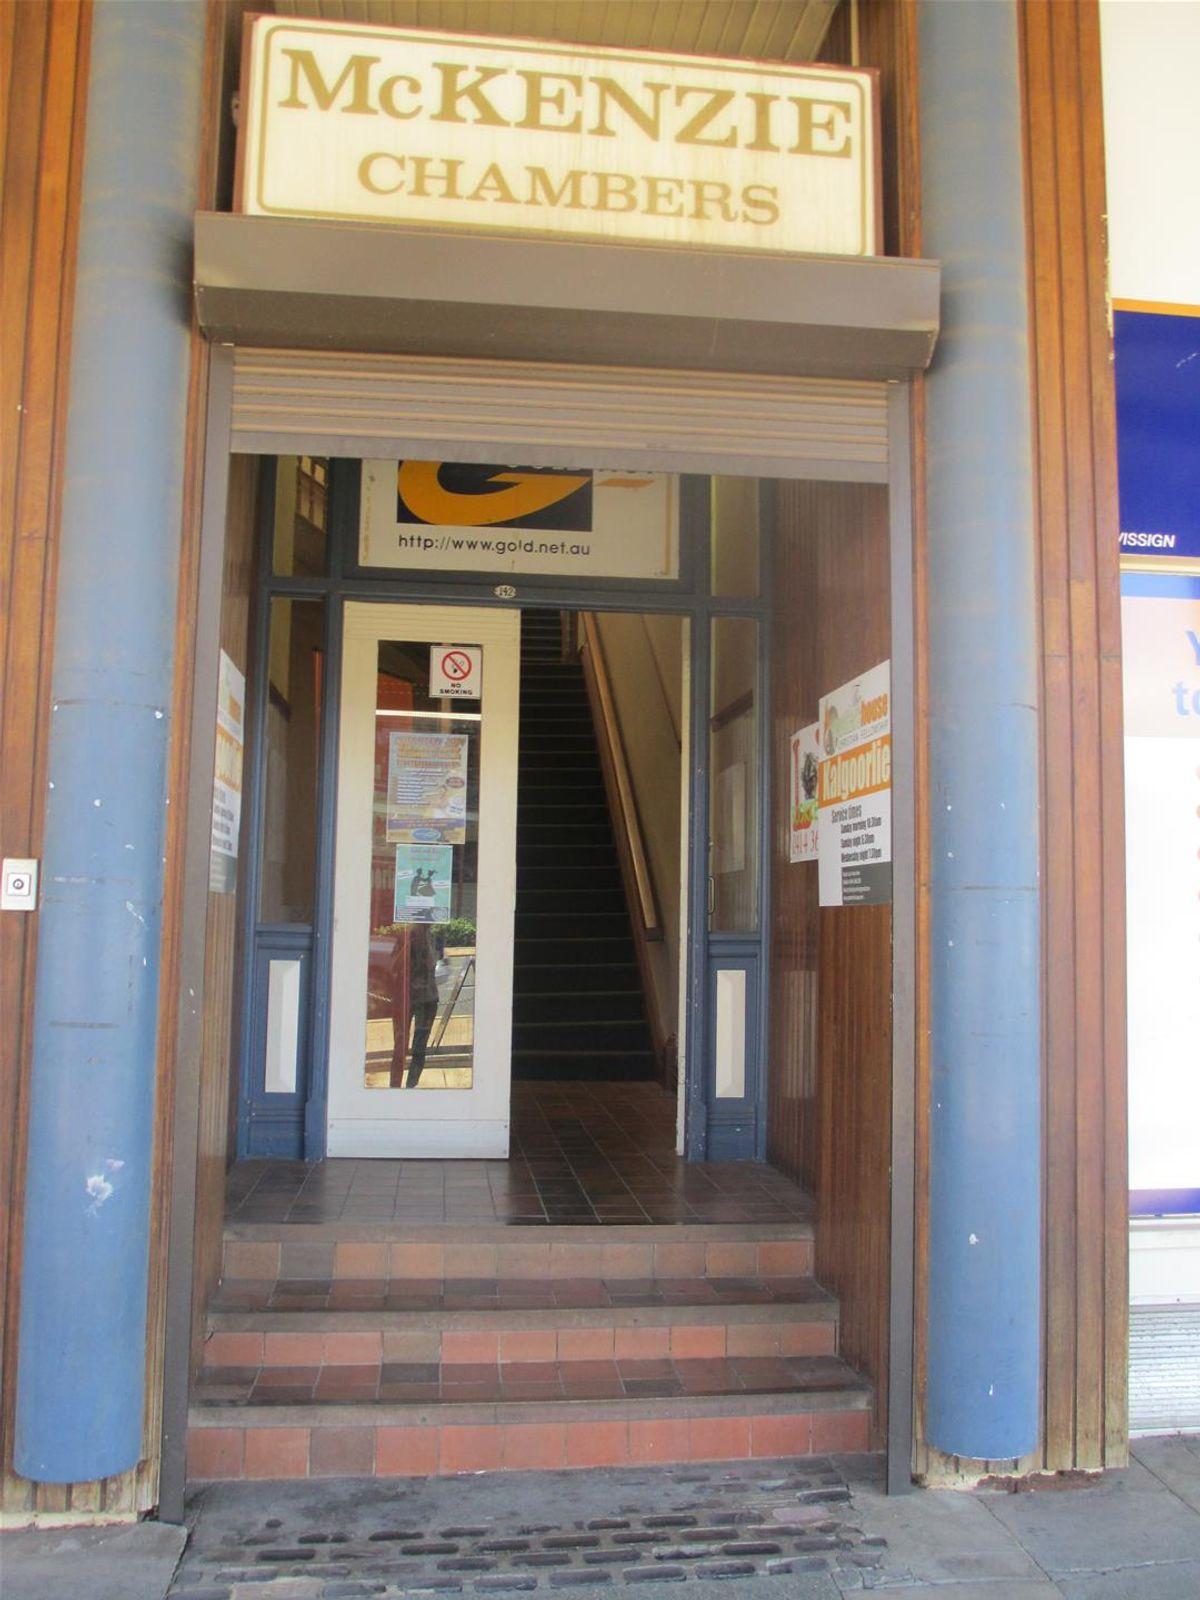 F11/142 Hannan Street, Kalgoorlie, WA 6430